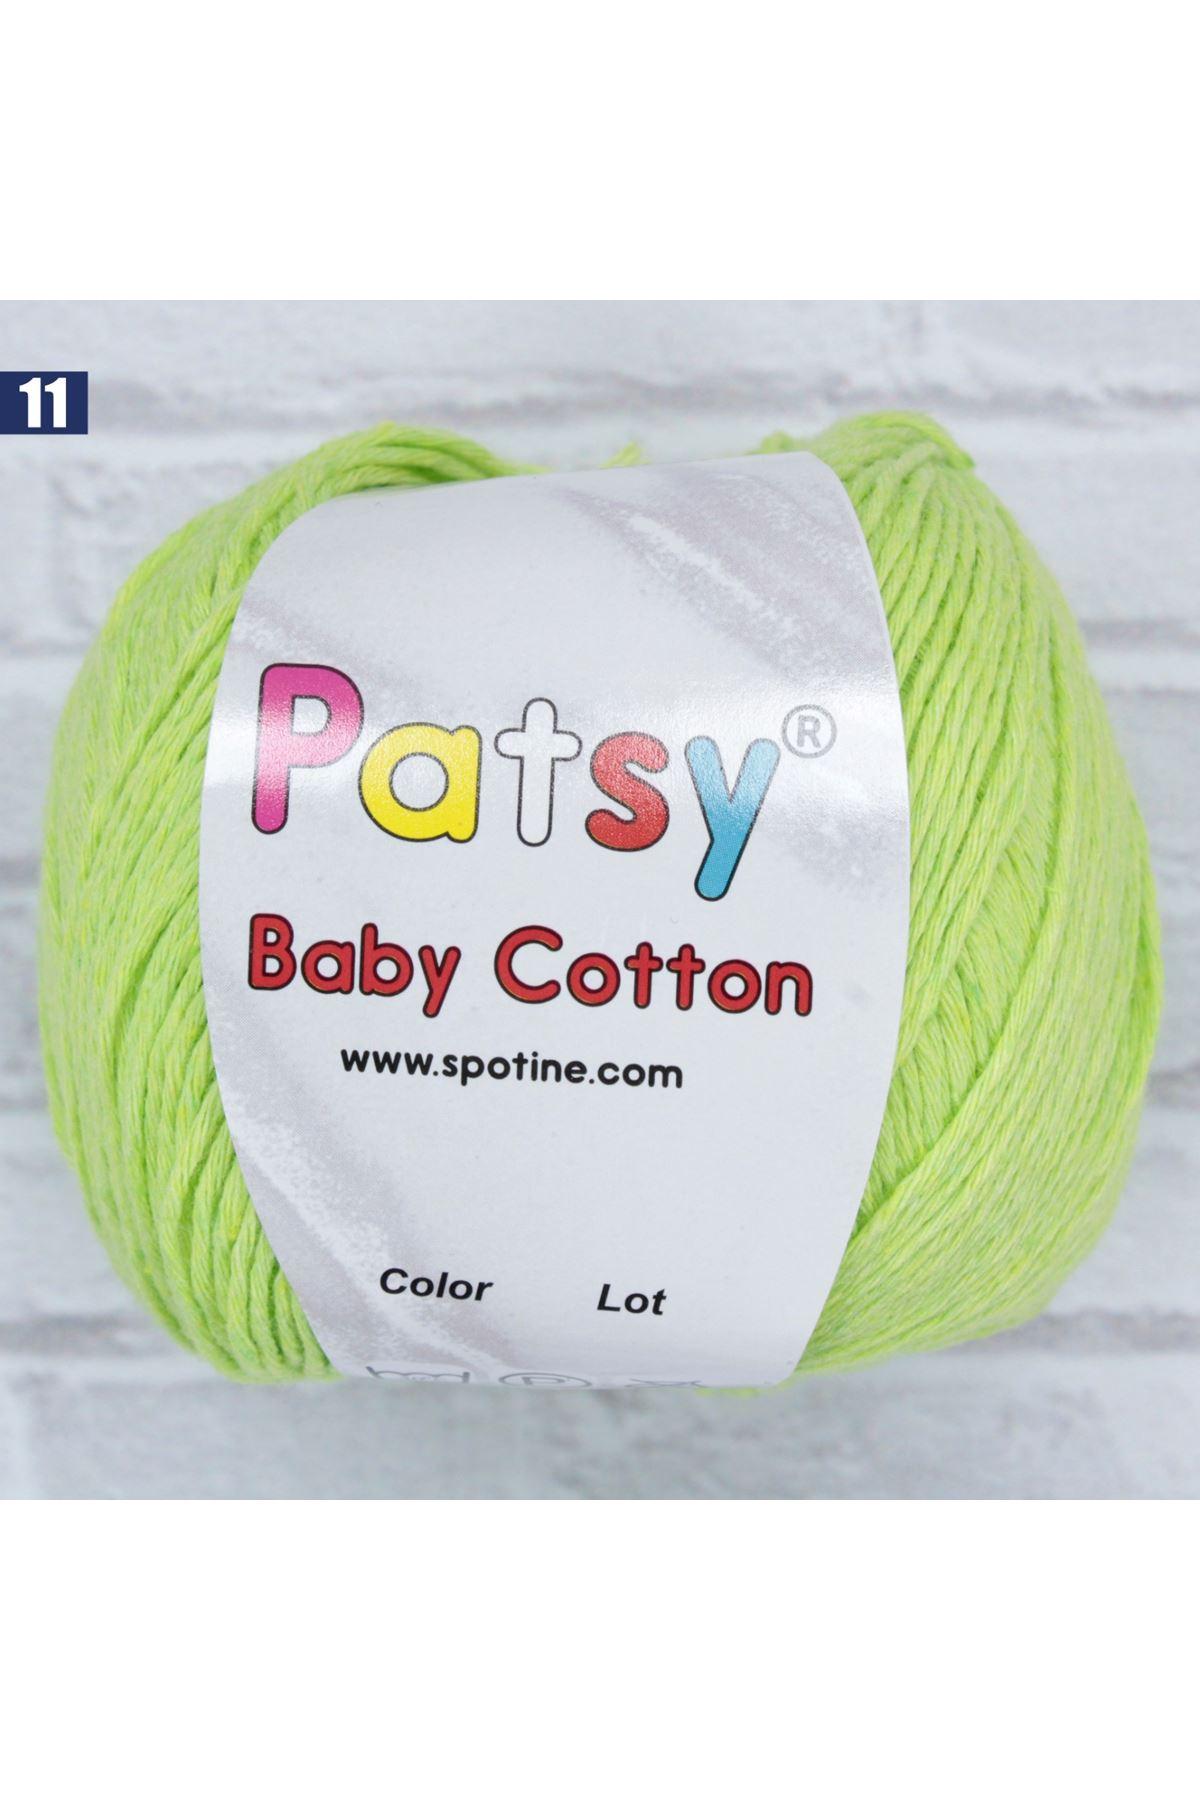 Patsy Baby Cotton 11